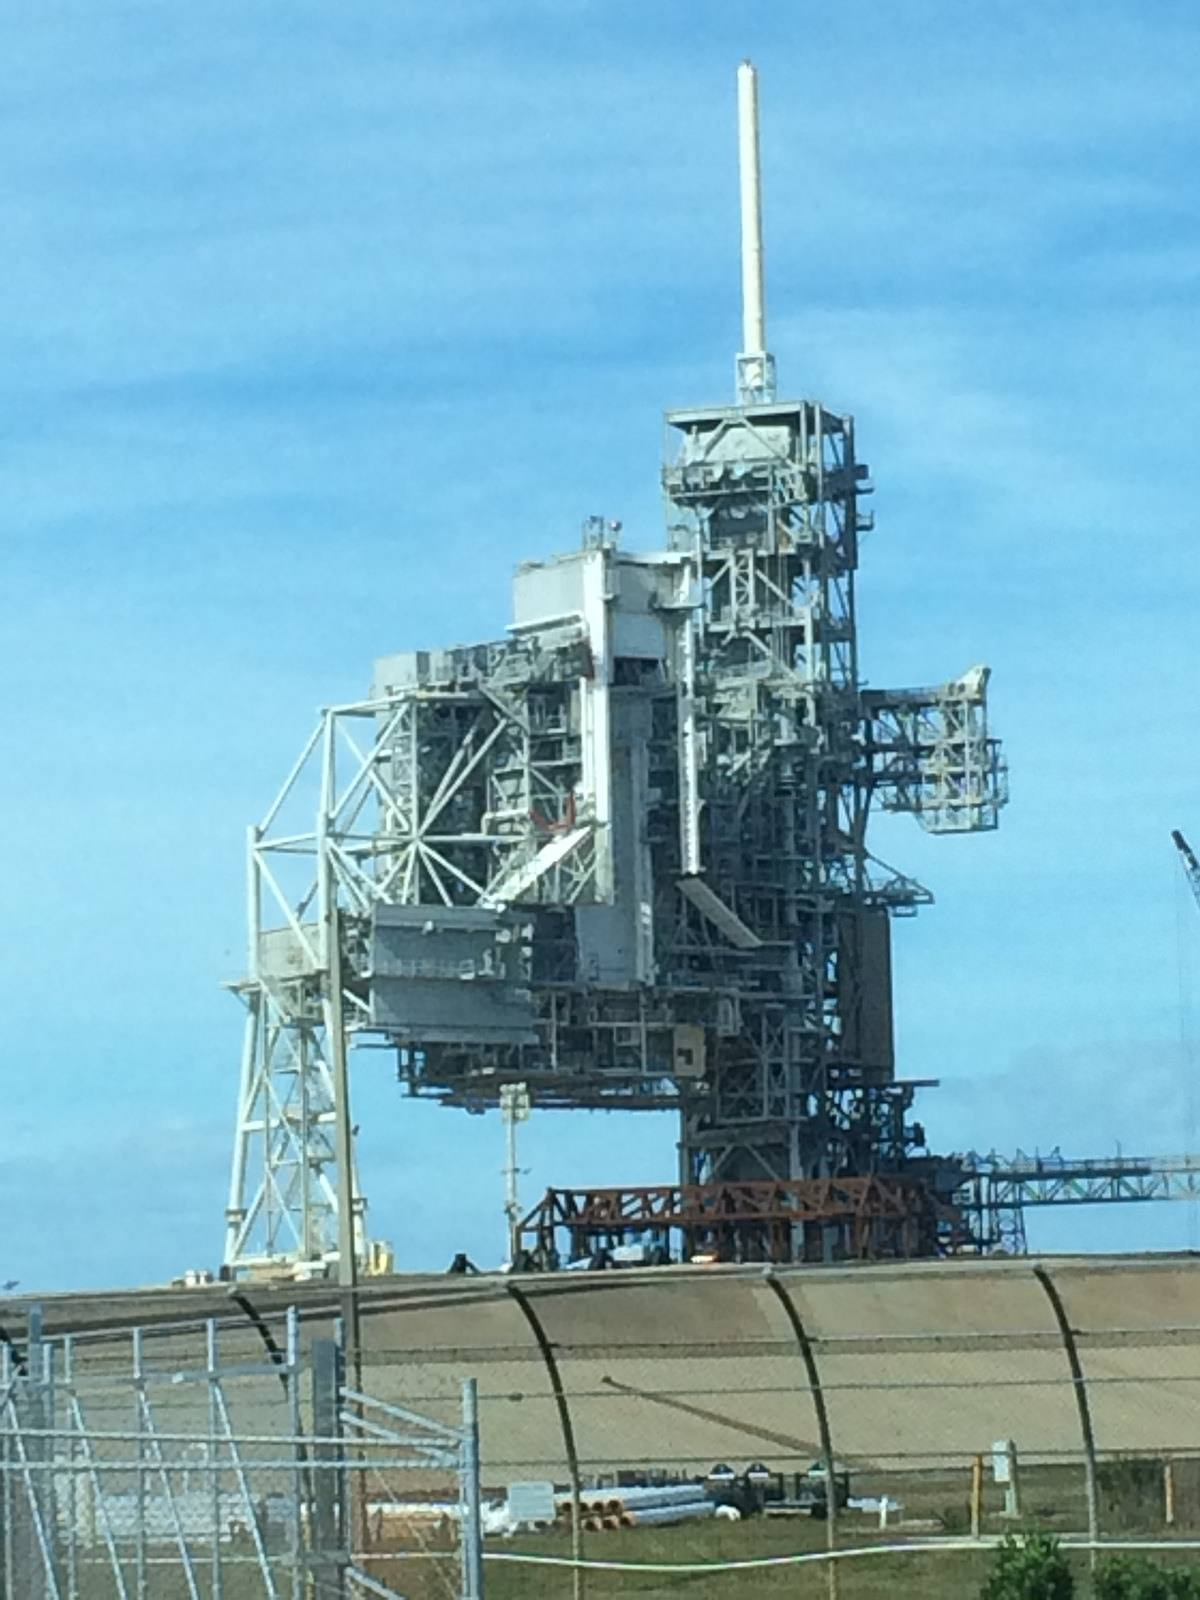 kennedy space center7 Kennedy Space Center   Popular Destination